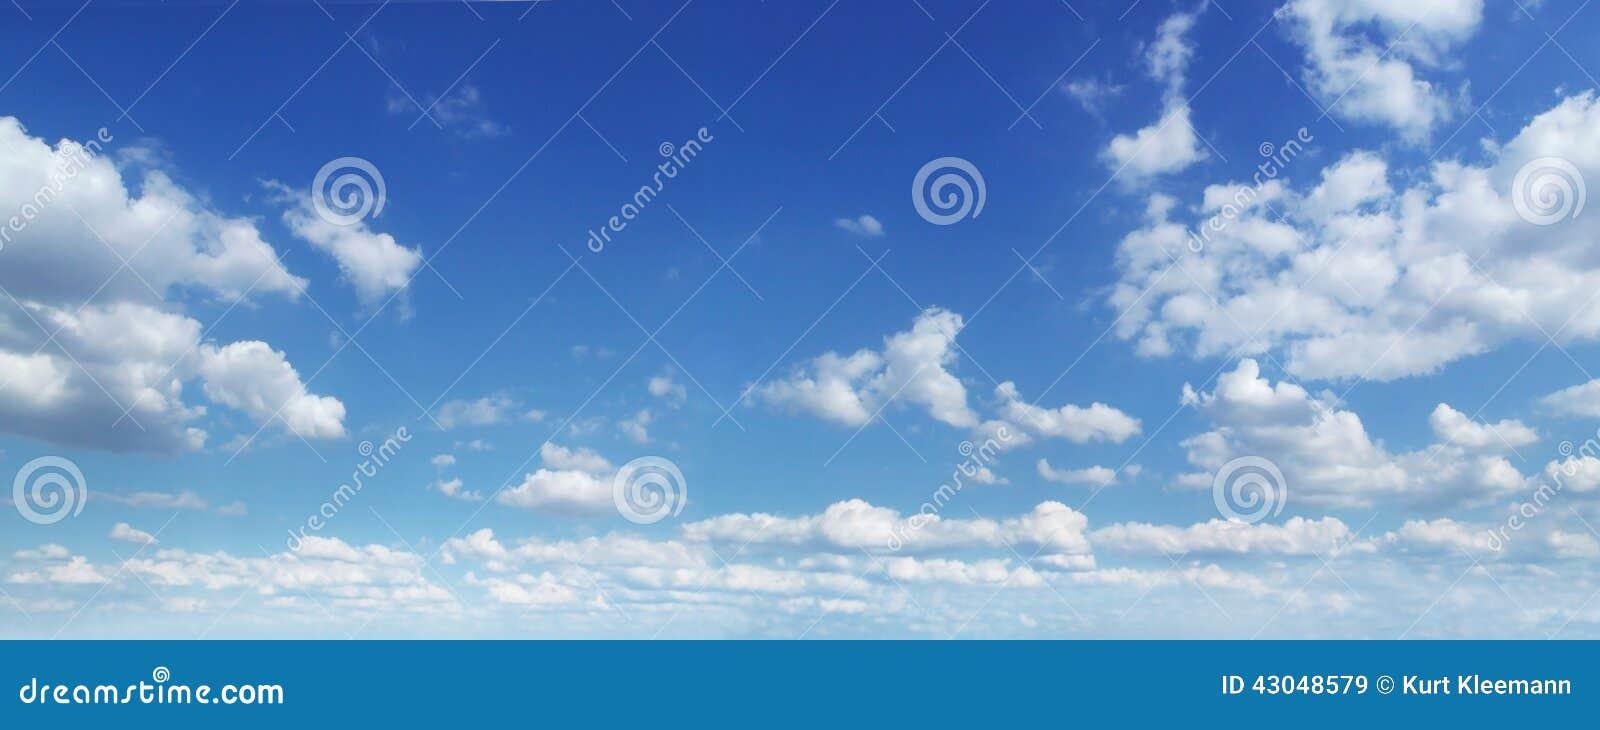 Panorama del cielo nuvoloso